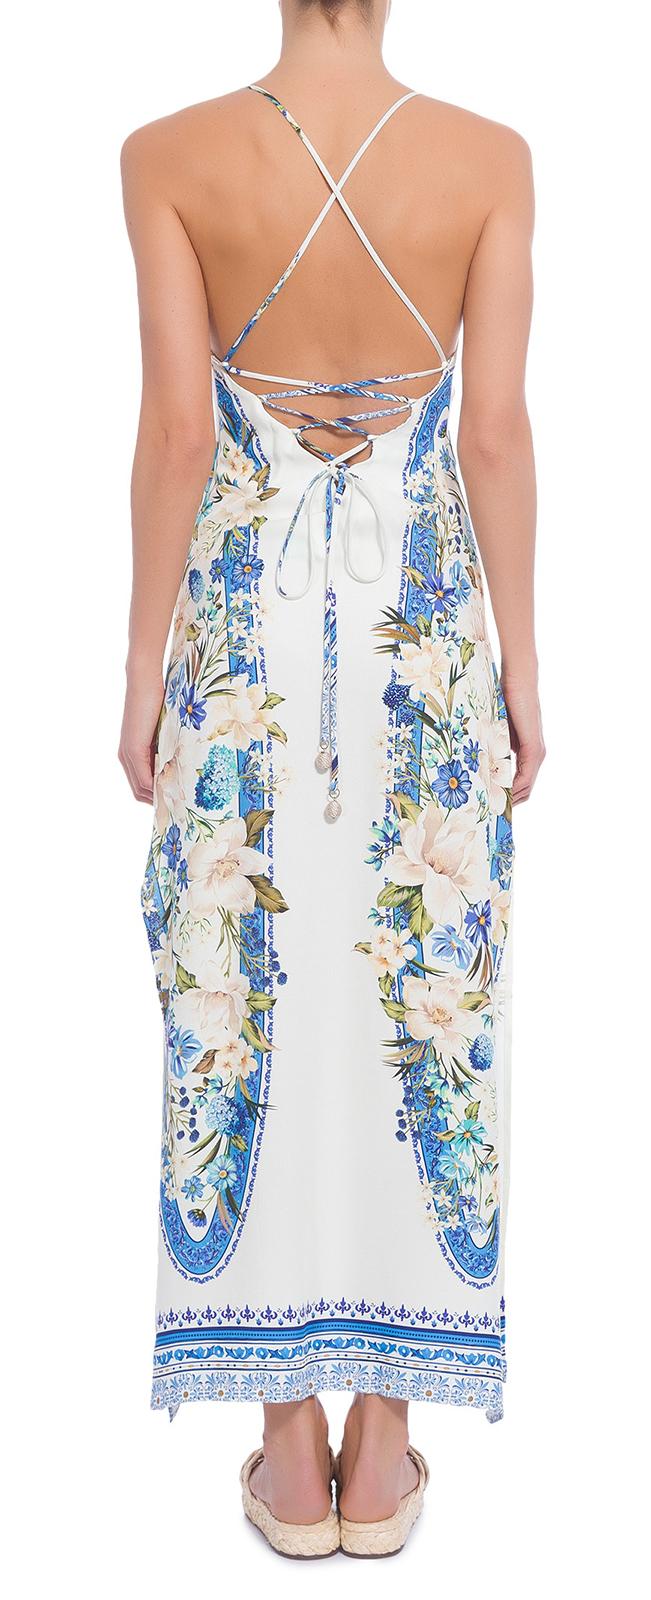 Vestido Comprido Direito Branco C Flores Costas Laçadas Vestido Farm Reto Fenda Floral Tavira